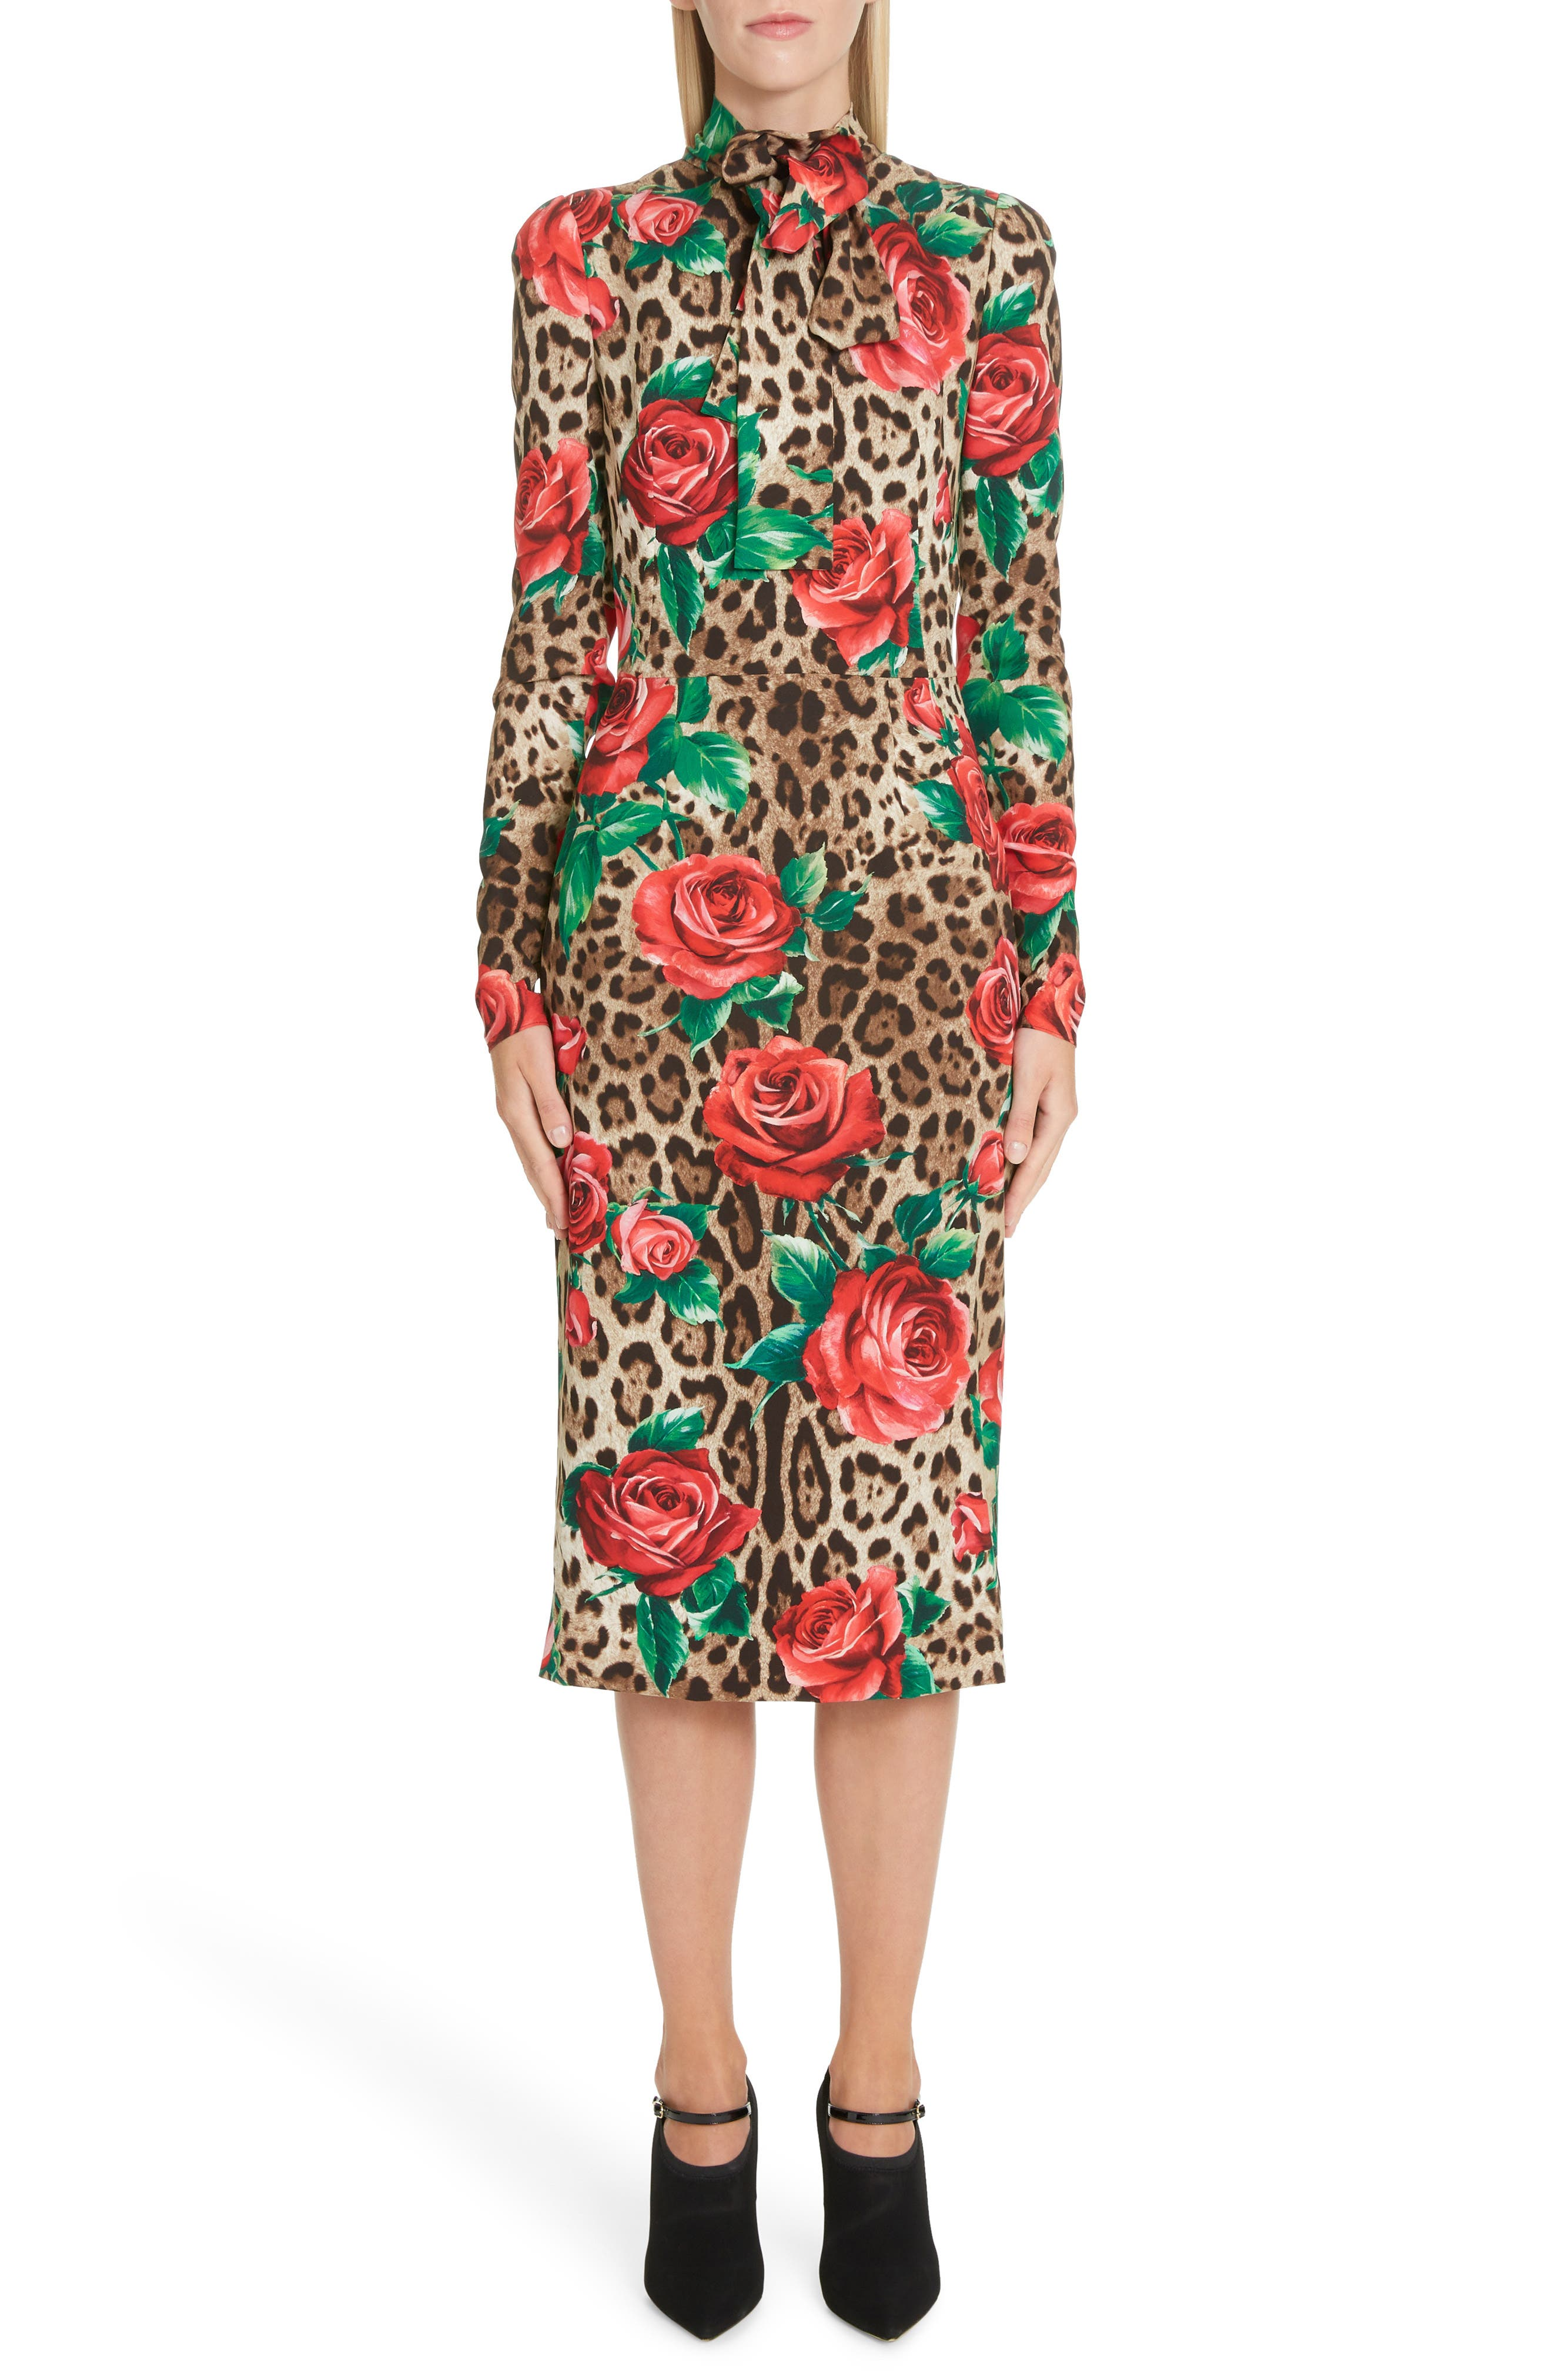 Dolce & gabbana Rose & Leopard Print Tie Neck Stretch Silk Midi Dress, US / 46 IT - Brown